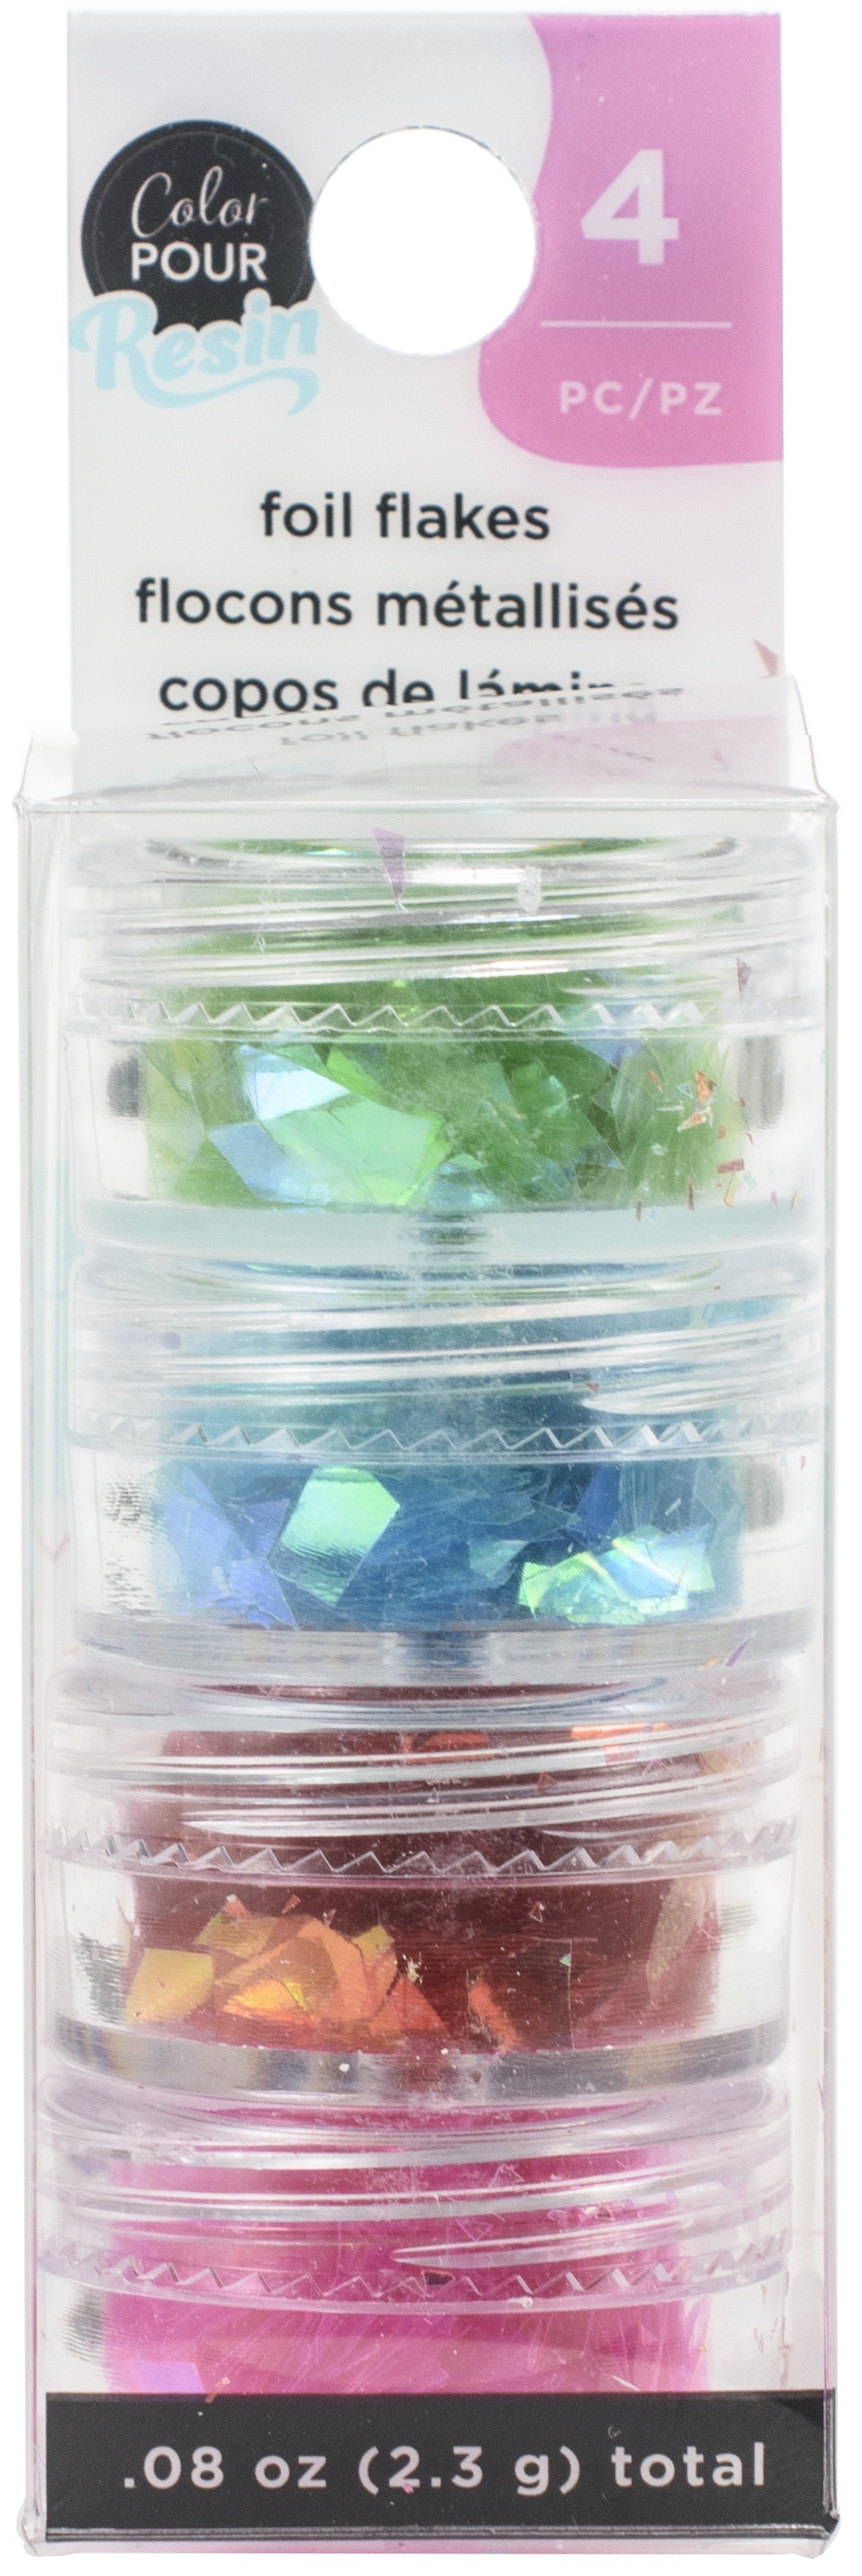 American Crafts Color Pour Resin Mix-Ins-Foil Flakes - Primary 4/Pkg